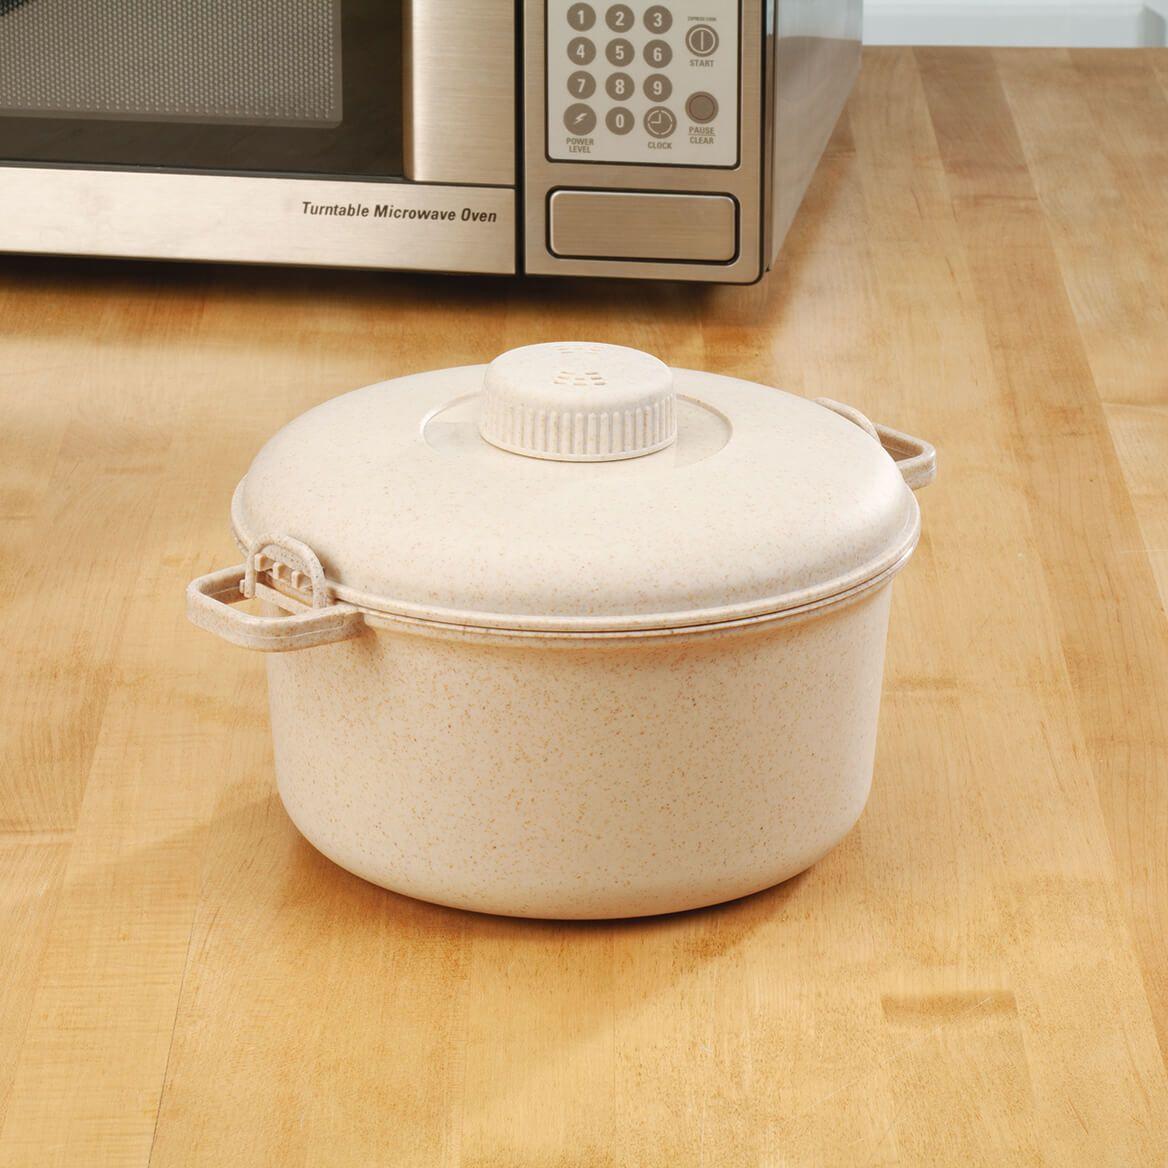 Microwave Pressure Cooker-371838